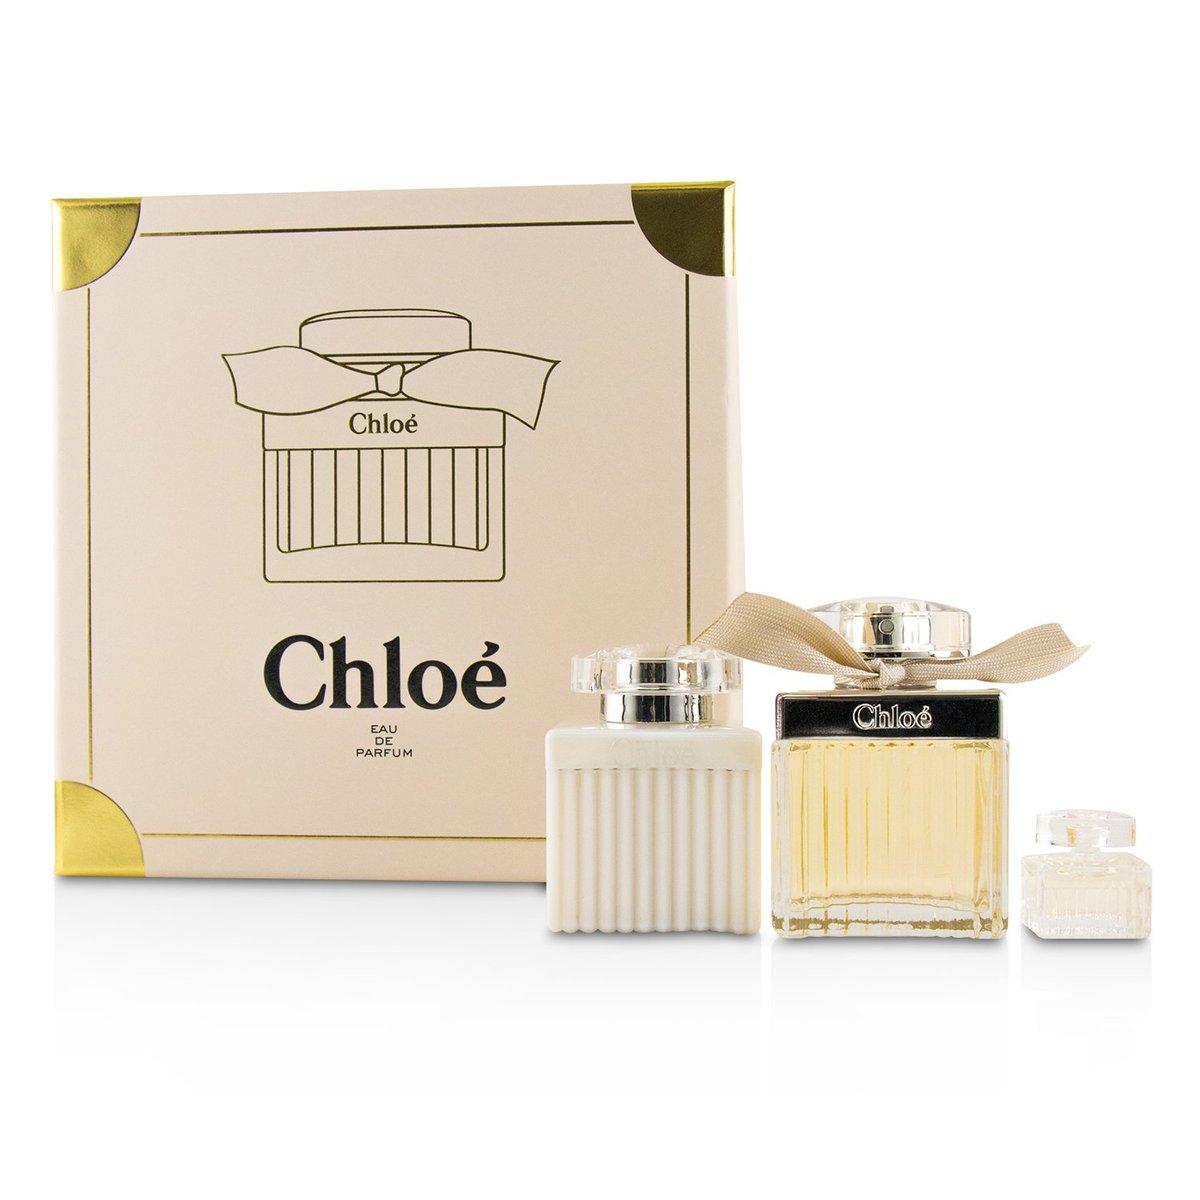 Chloe By Chloe Perfume Gift Set Perfume Malaysia Best Price